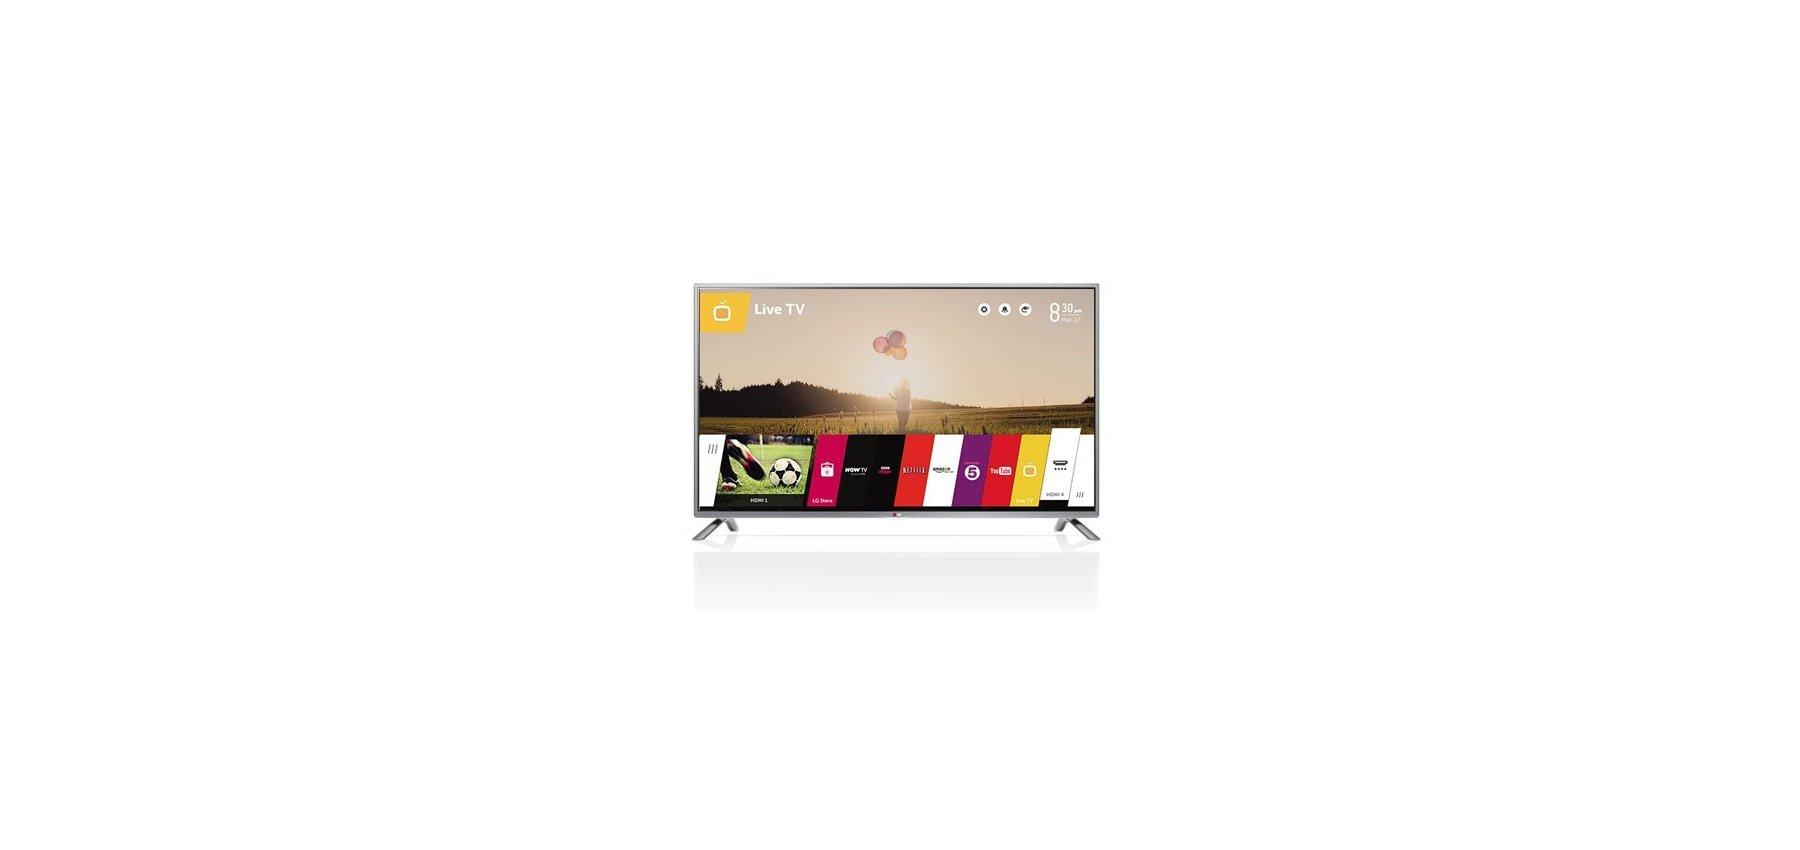 Telewizor LG 47LB630V/47CALI/SMART TV/ Full HD 1920 x 1080